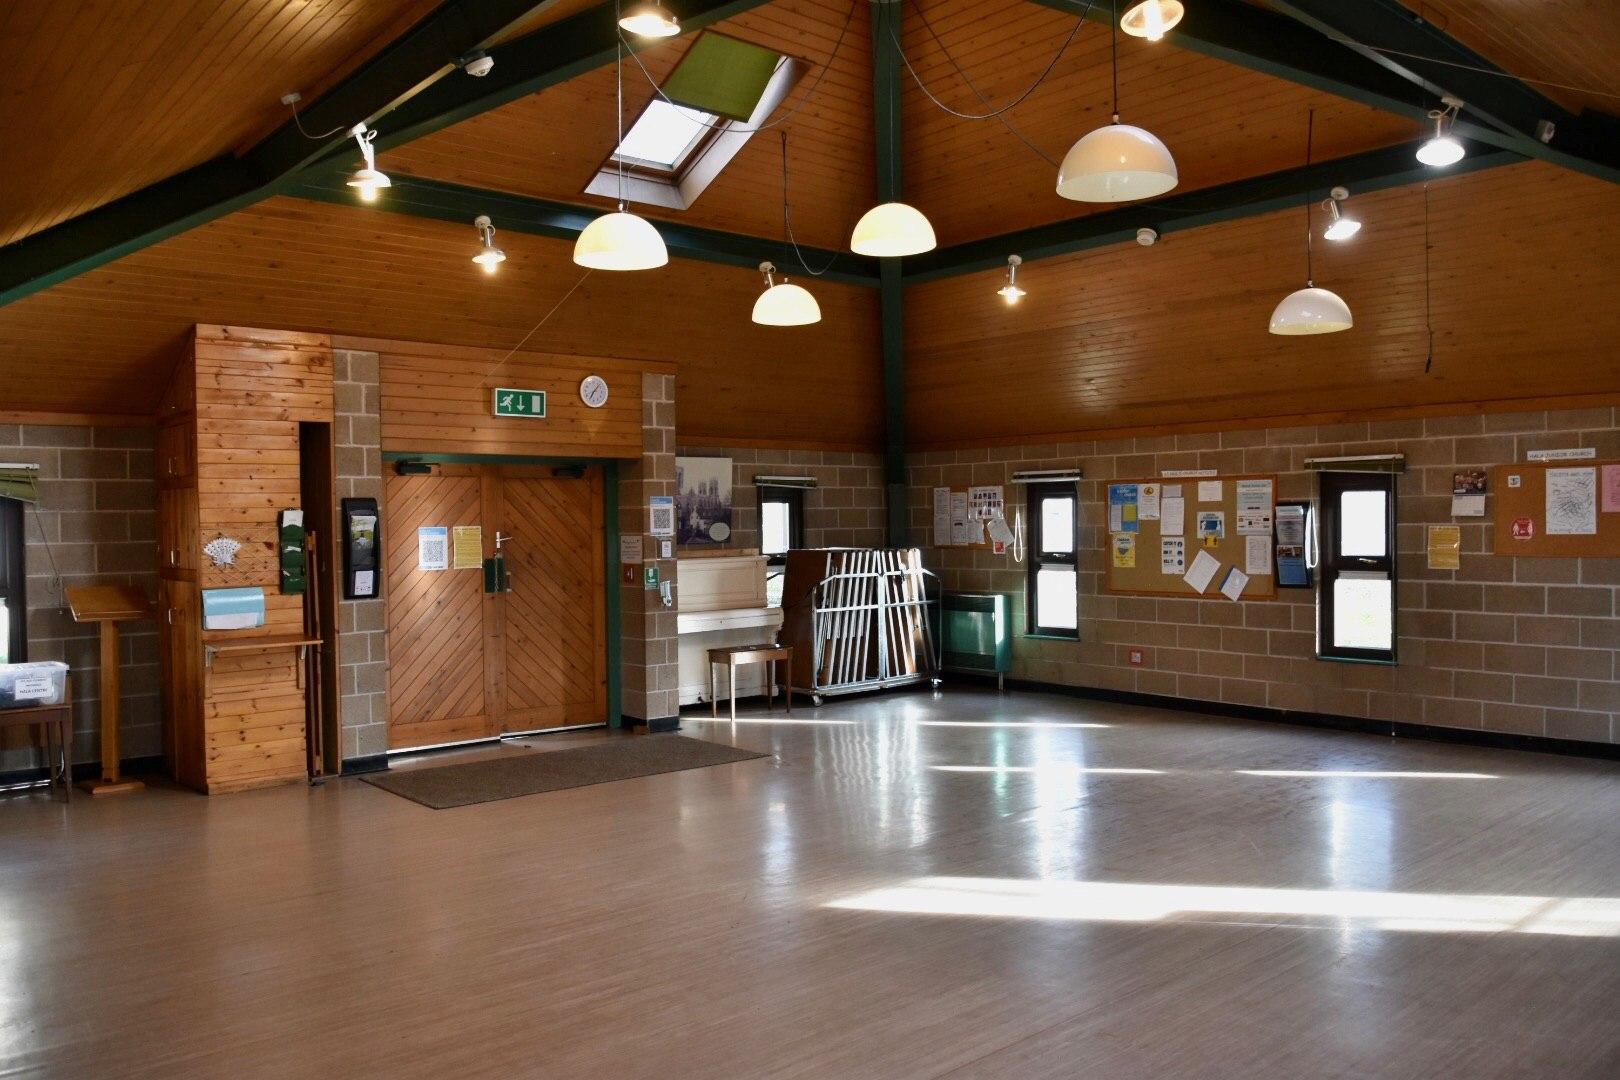 Inside Hala Centre